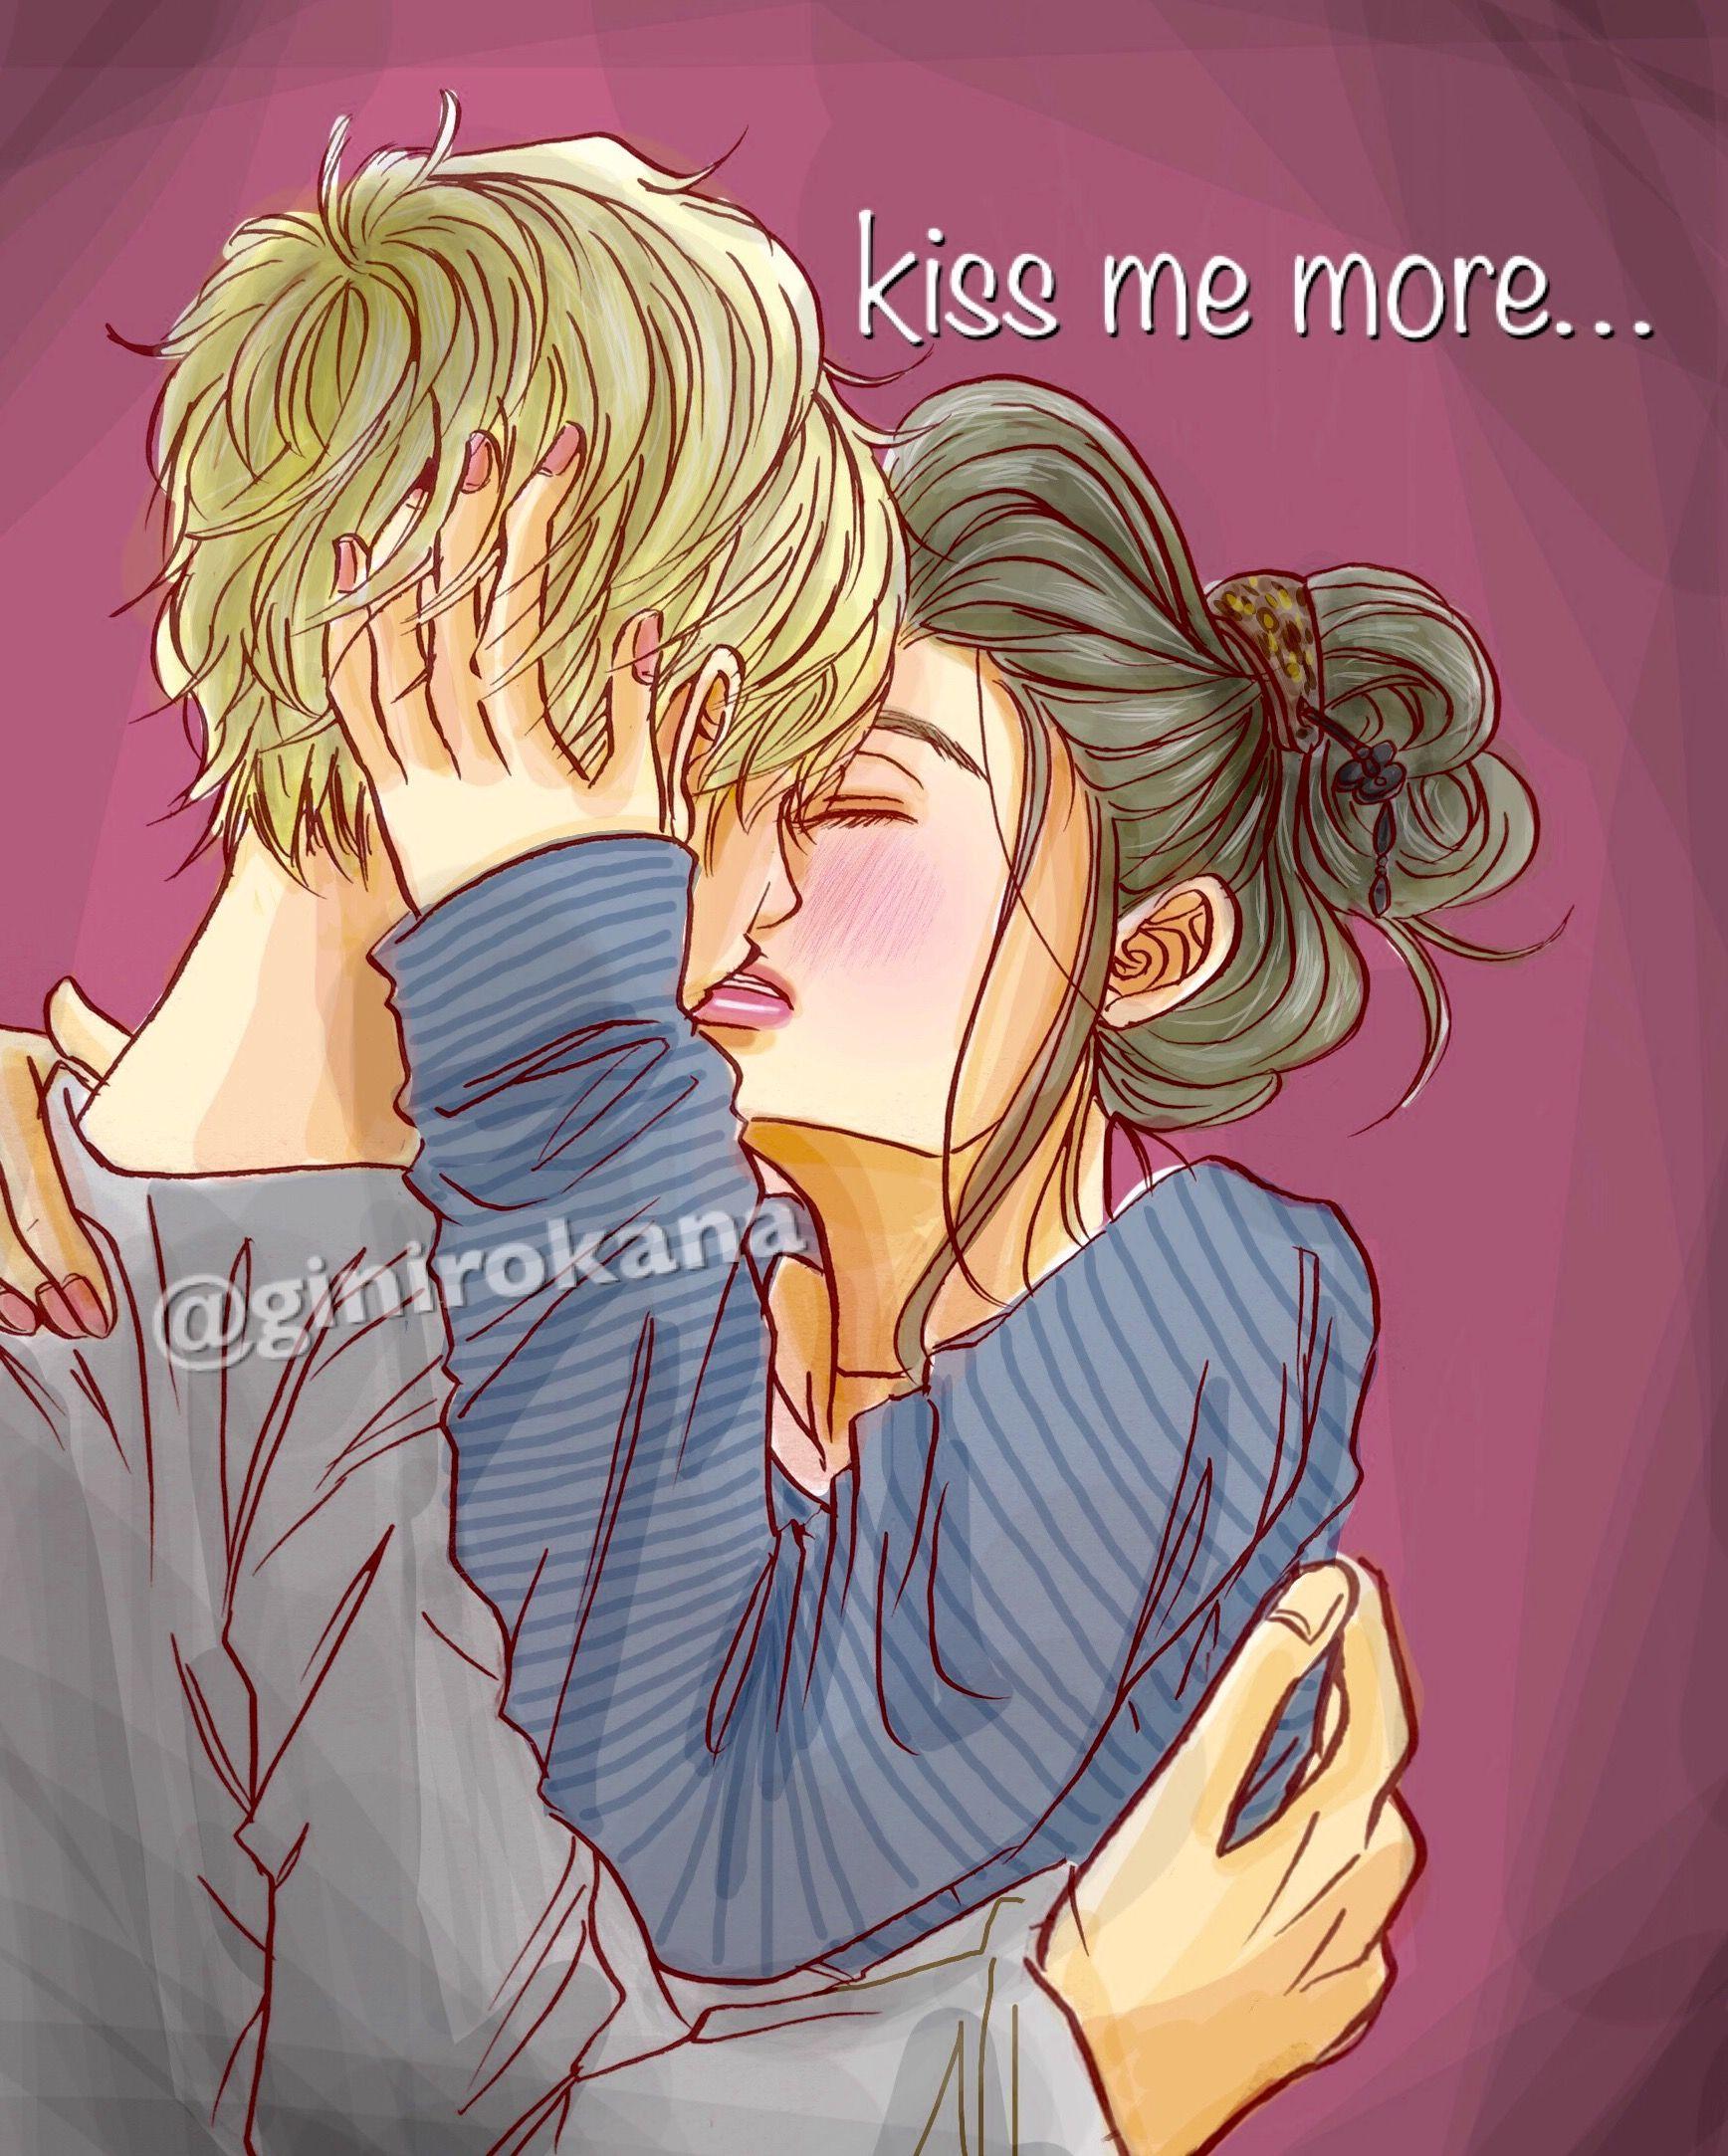 kiss キス カップル 恋人 イラスト illustration 漫画 manga | 恋人